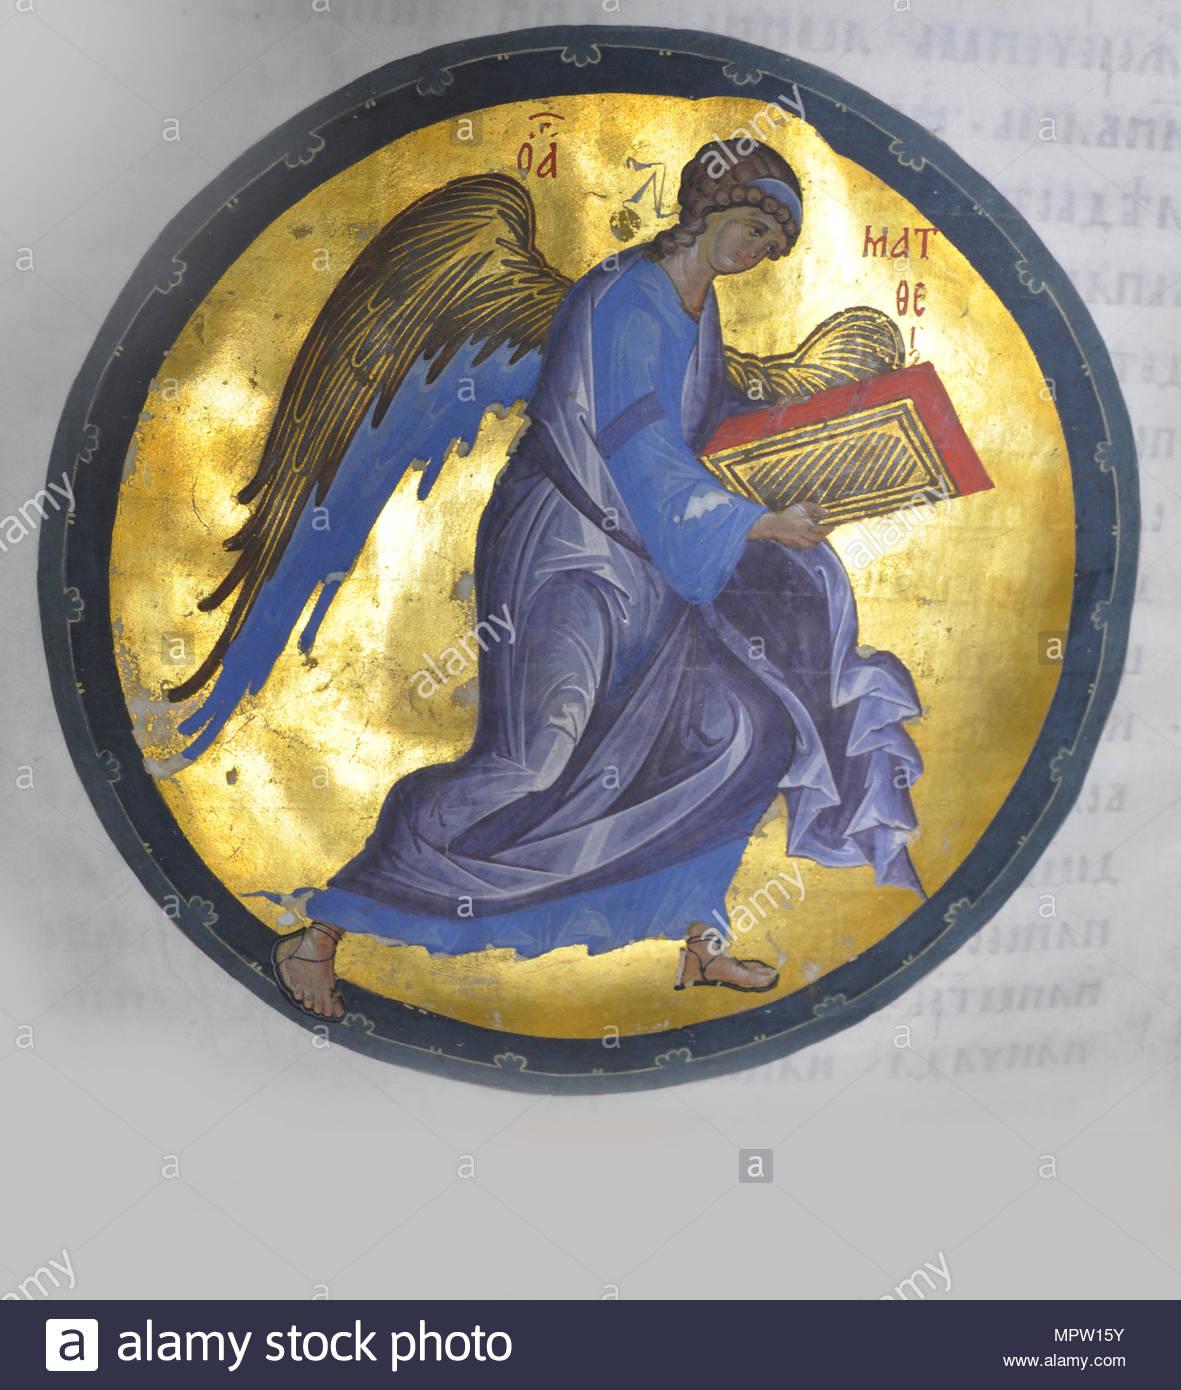 Angel Symbol Of Matthew The Evangelist Miniature From The Khitrovo